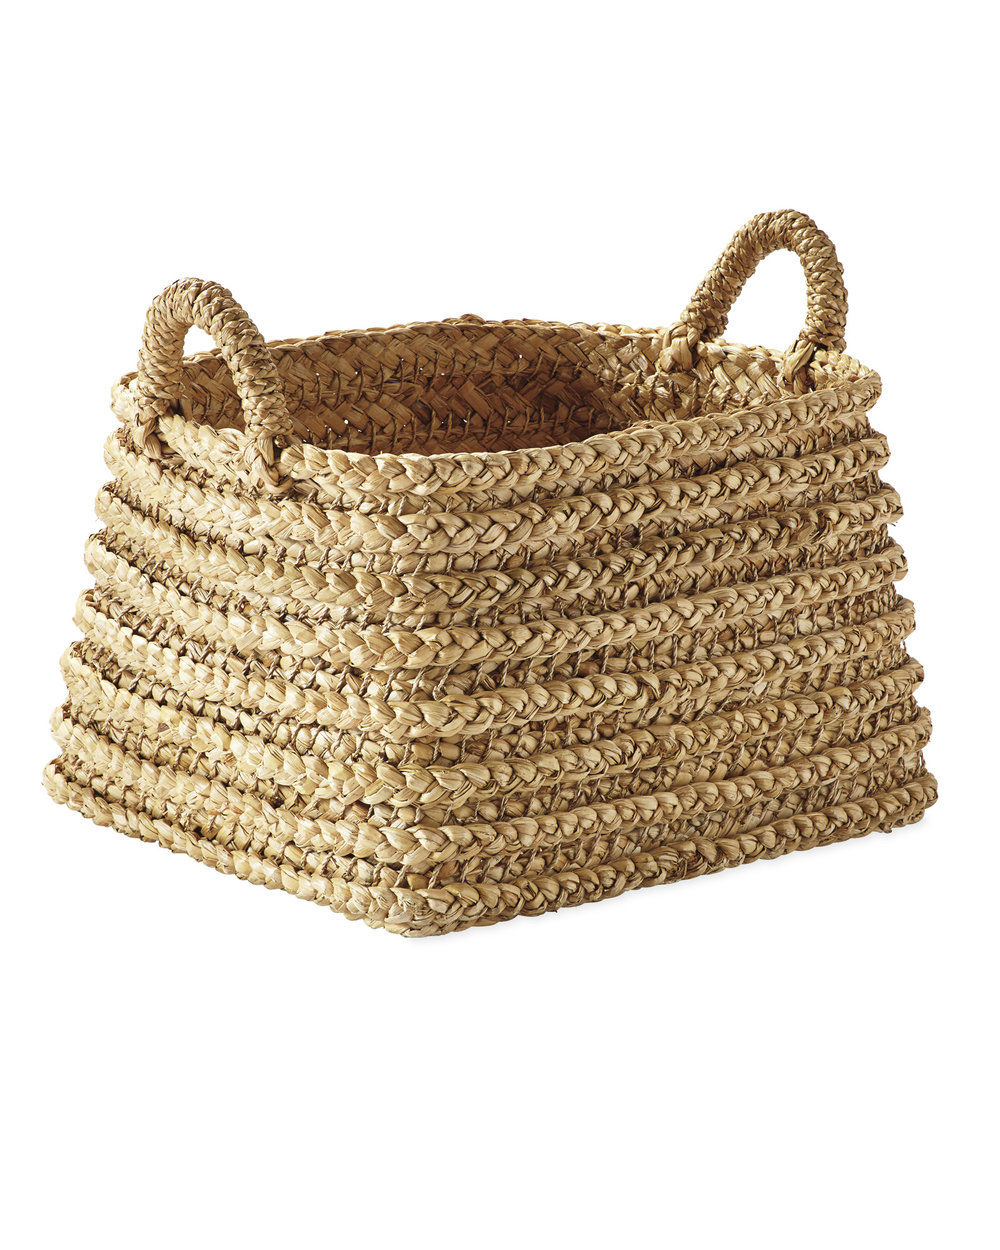 Olema Basket